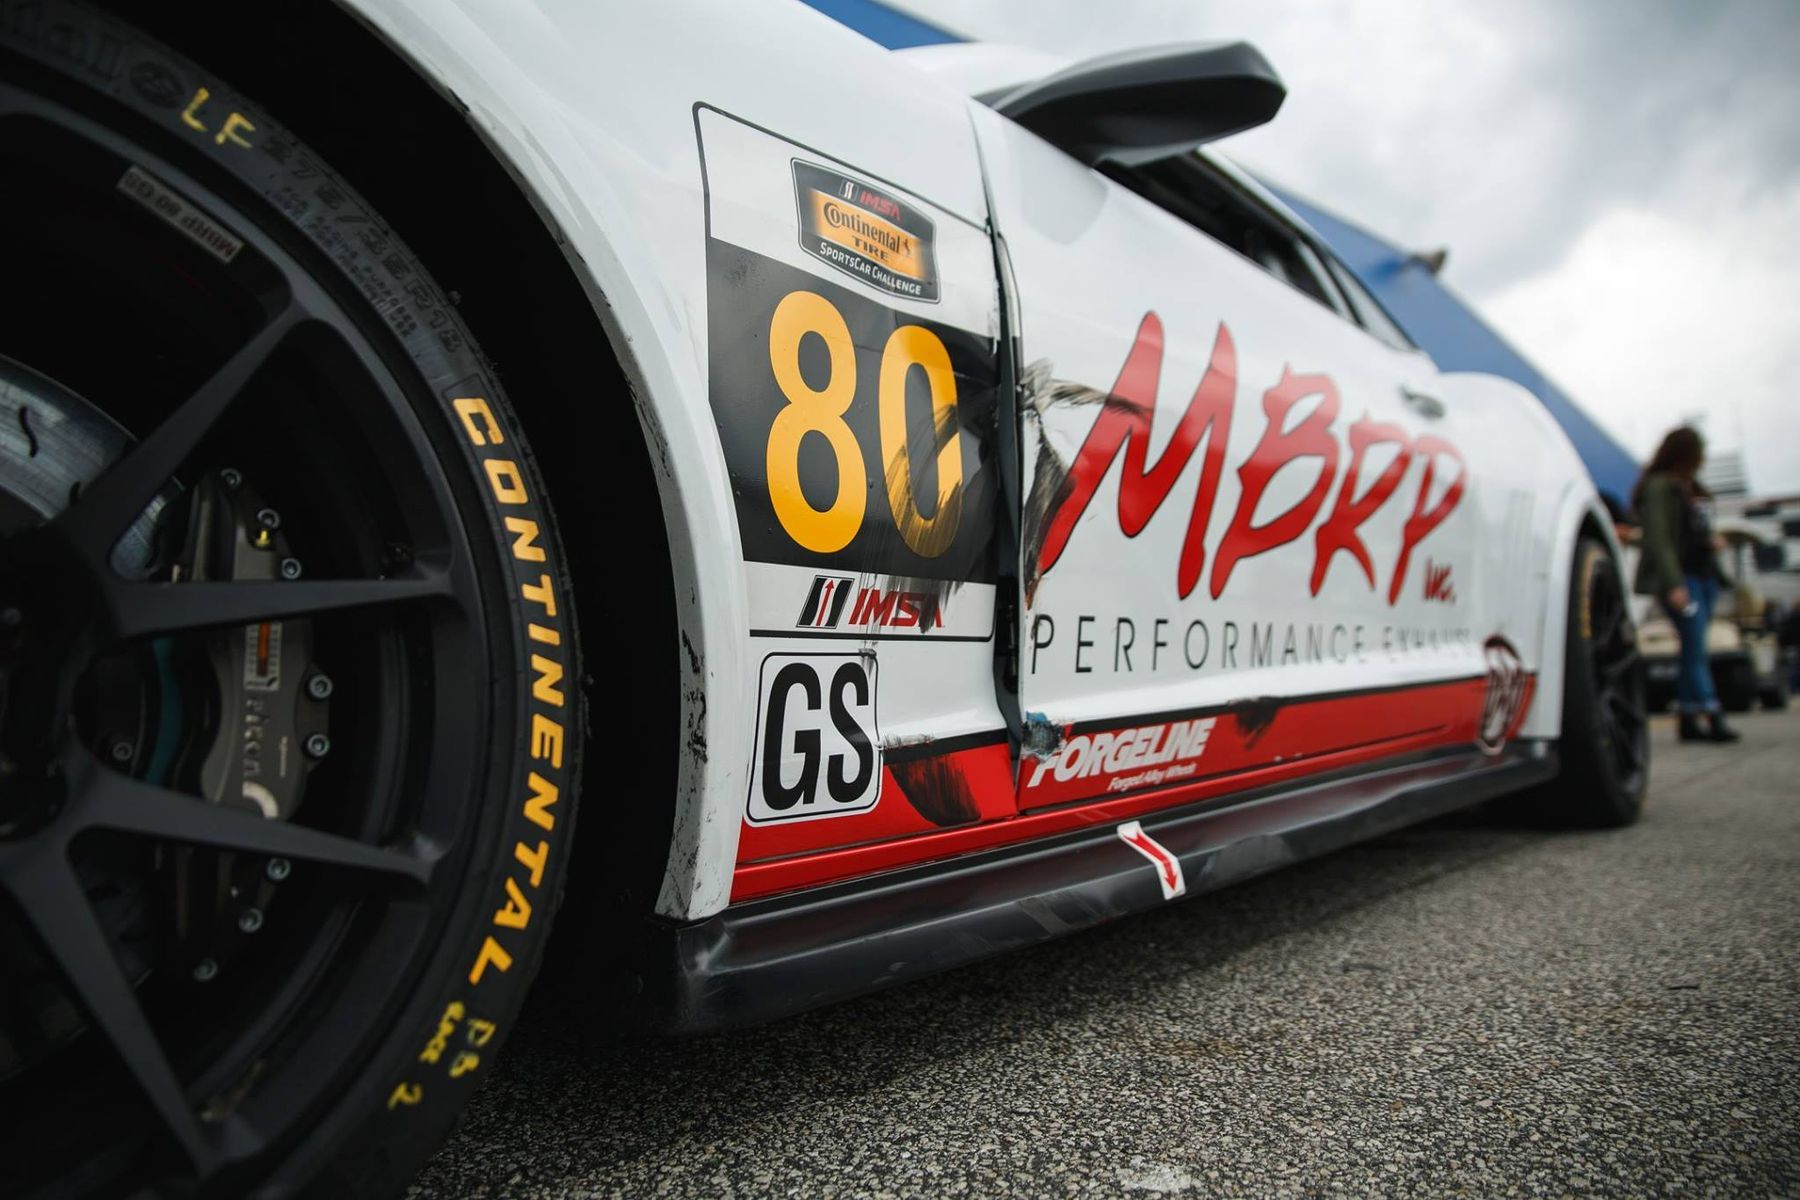 2014 Chevrolet Camaro | Mantella Autosports Camaro Z/28.R on Forgeline One Piece Forged Monoblock GS1R Wheels at Daytona